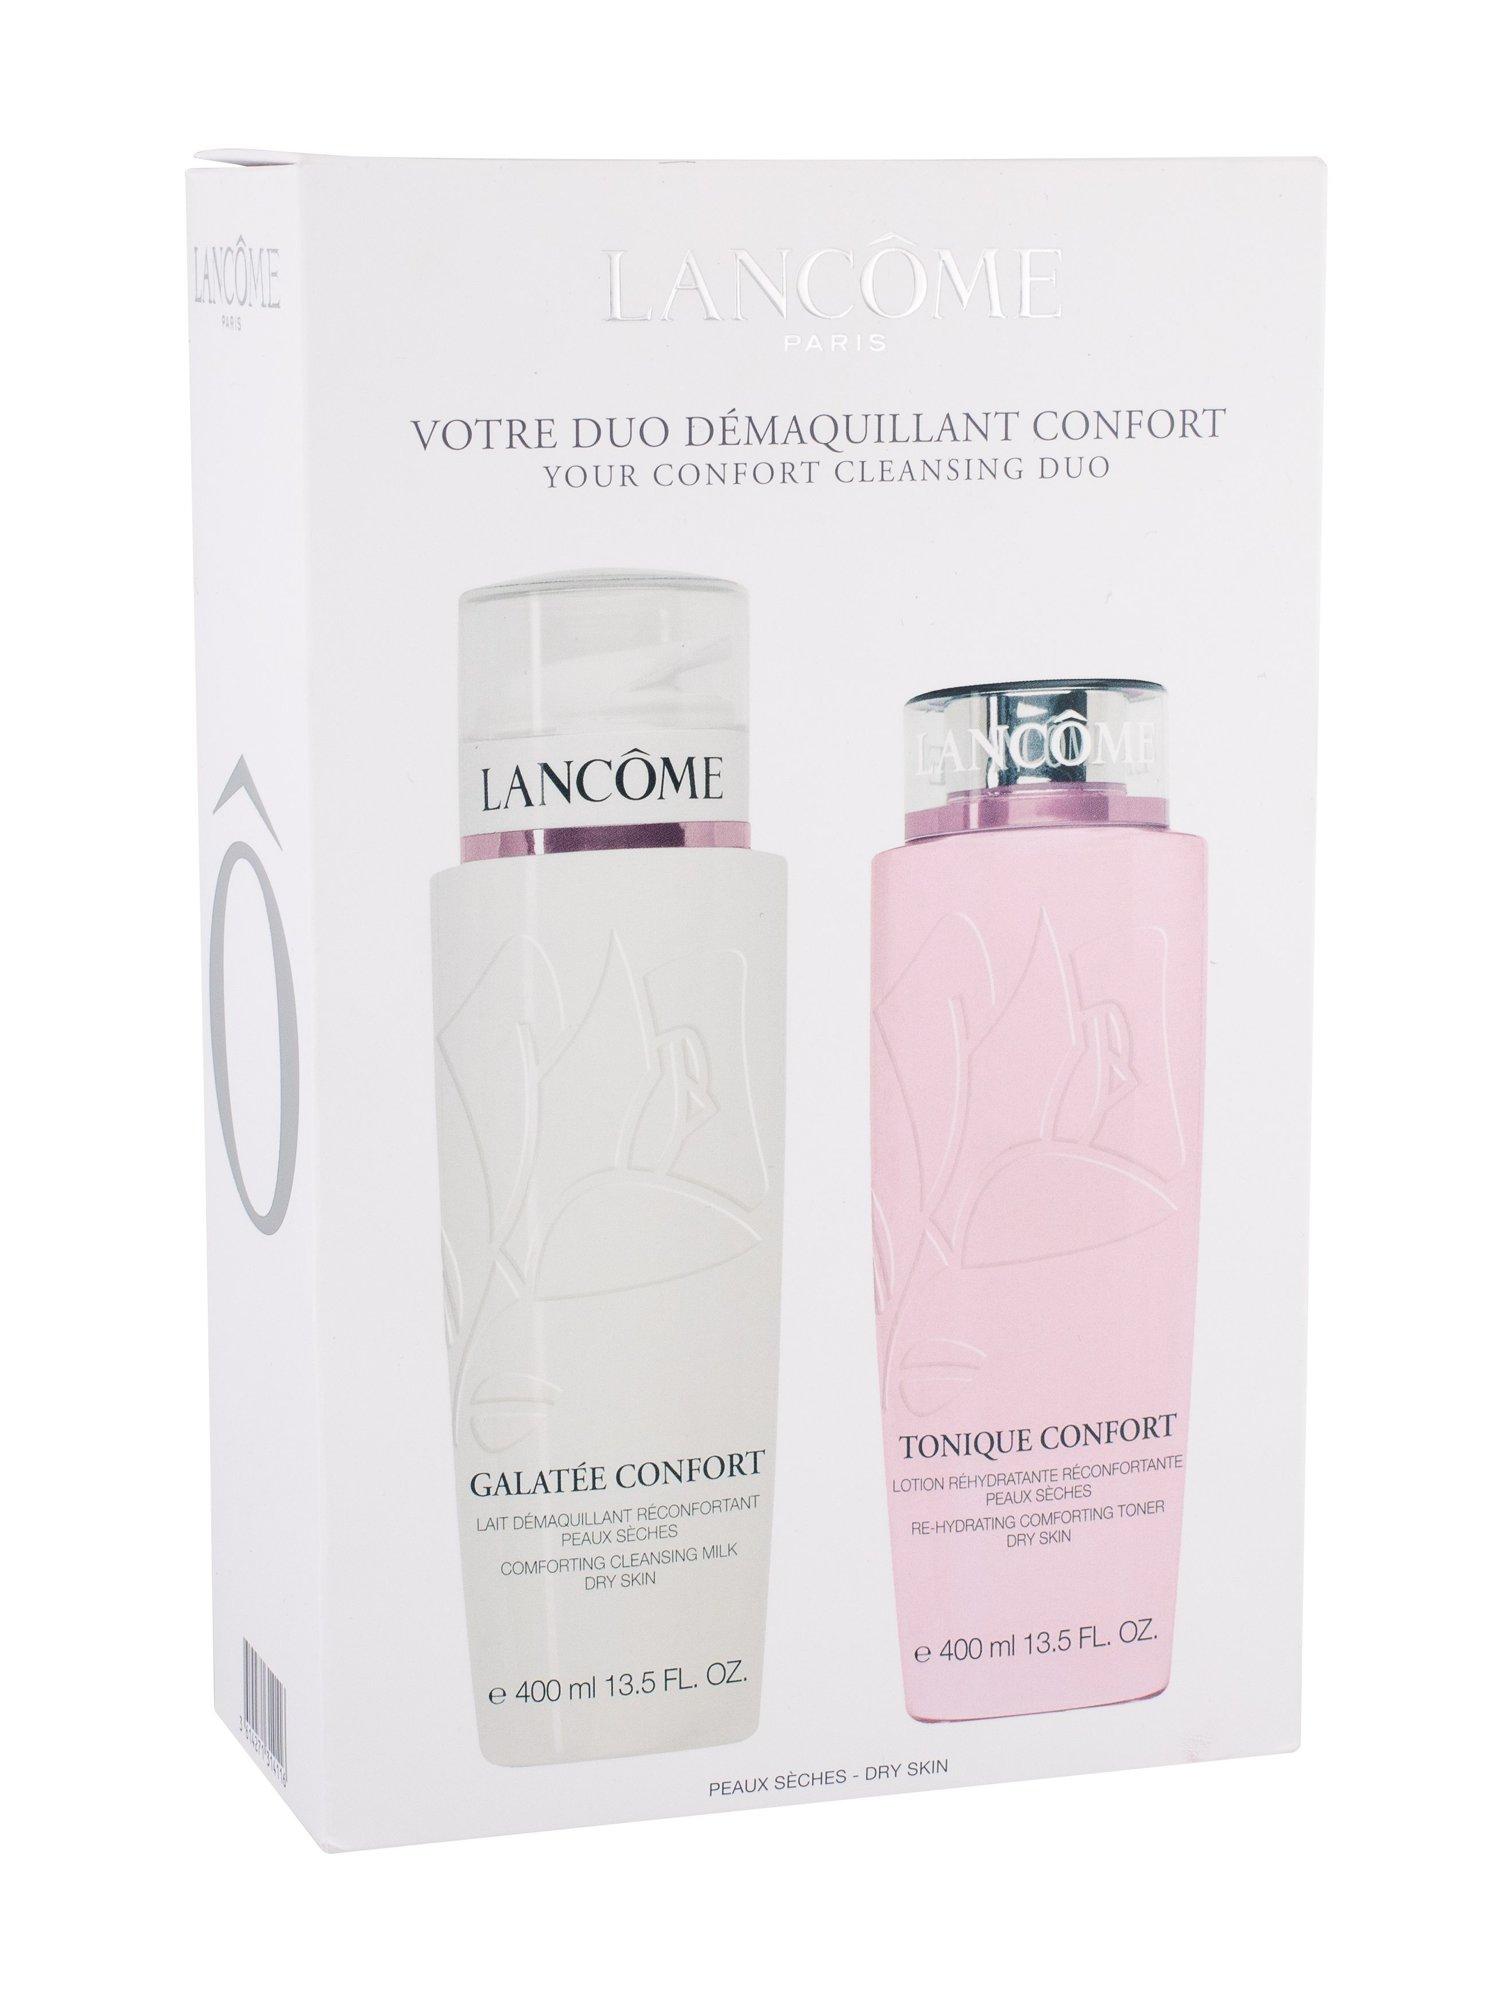 Lancôme Galatée Confort Cleansing Milk 400ml